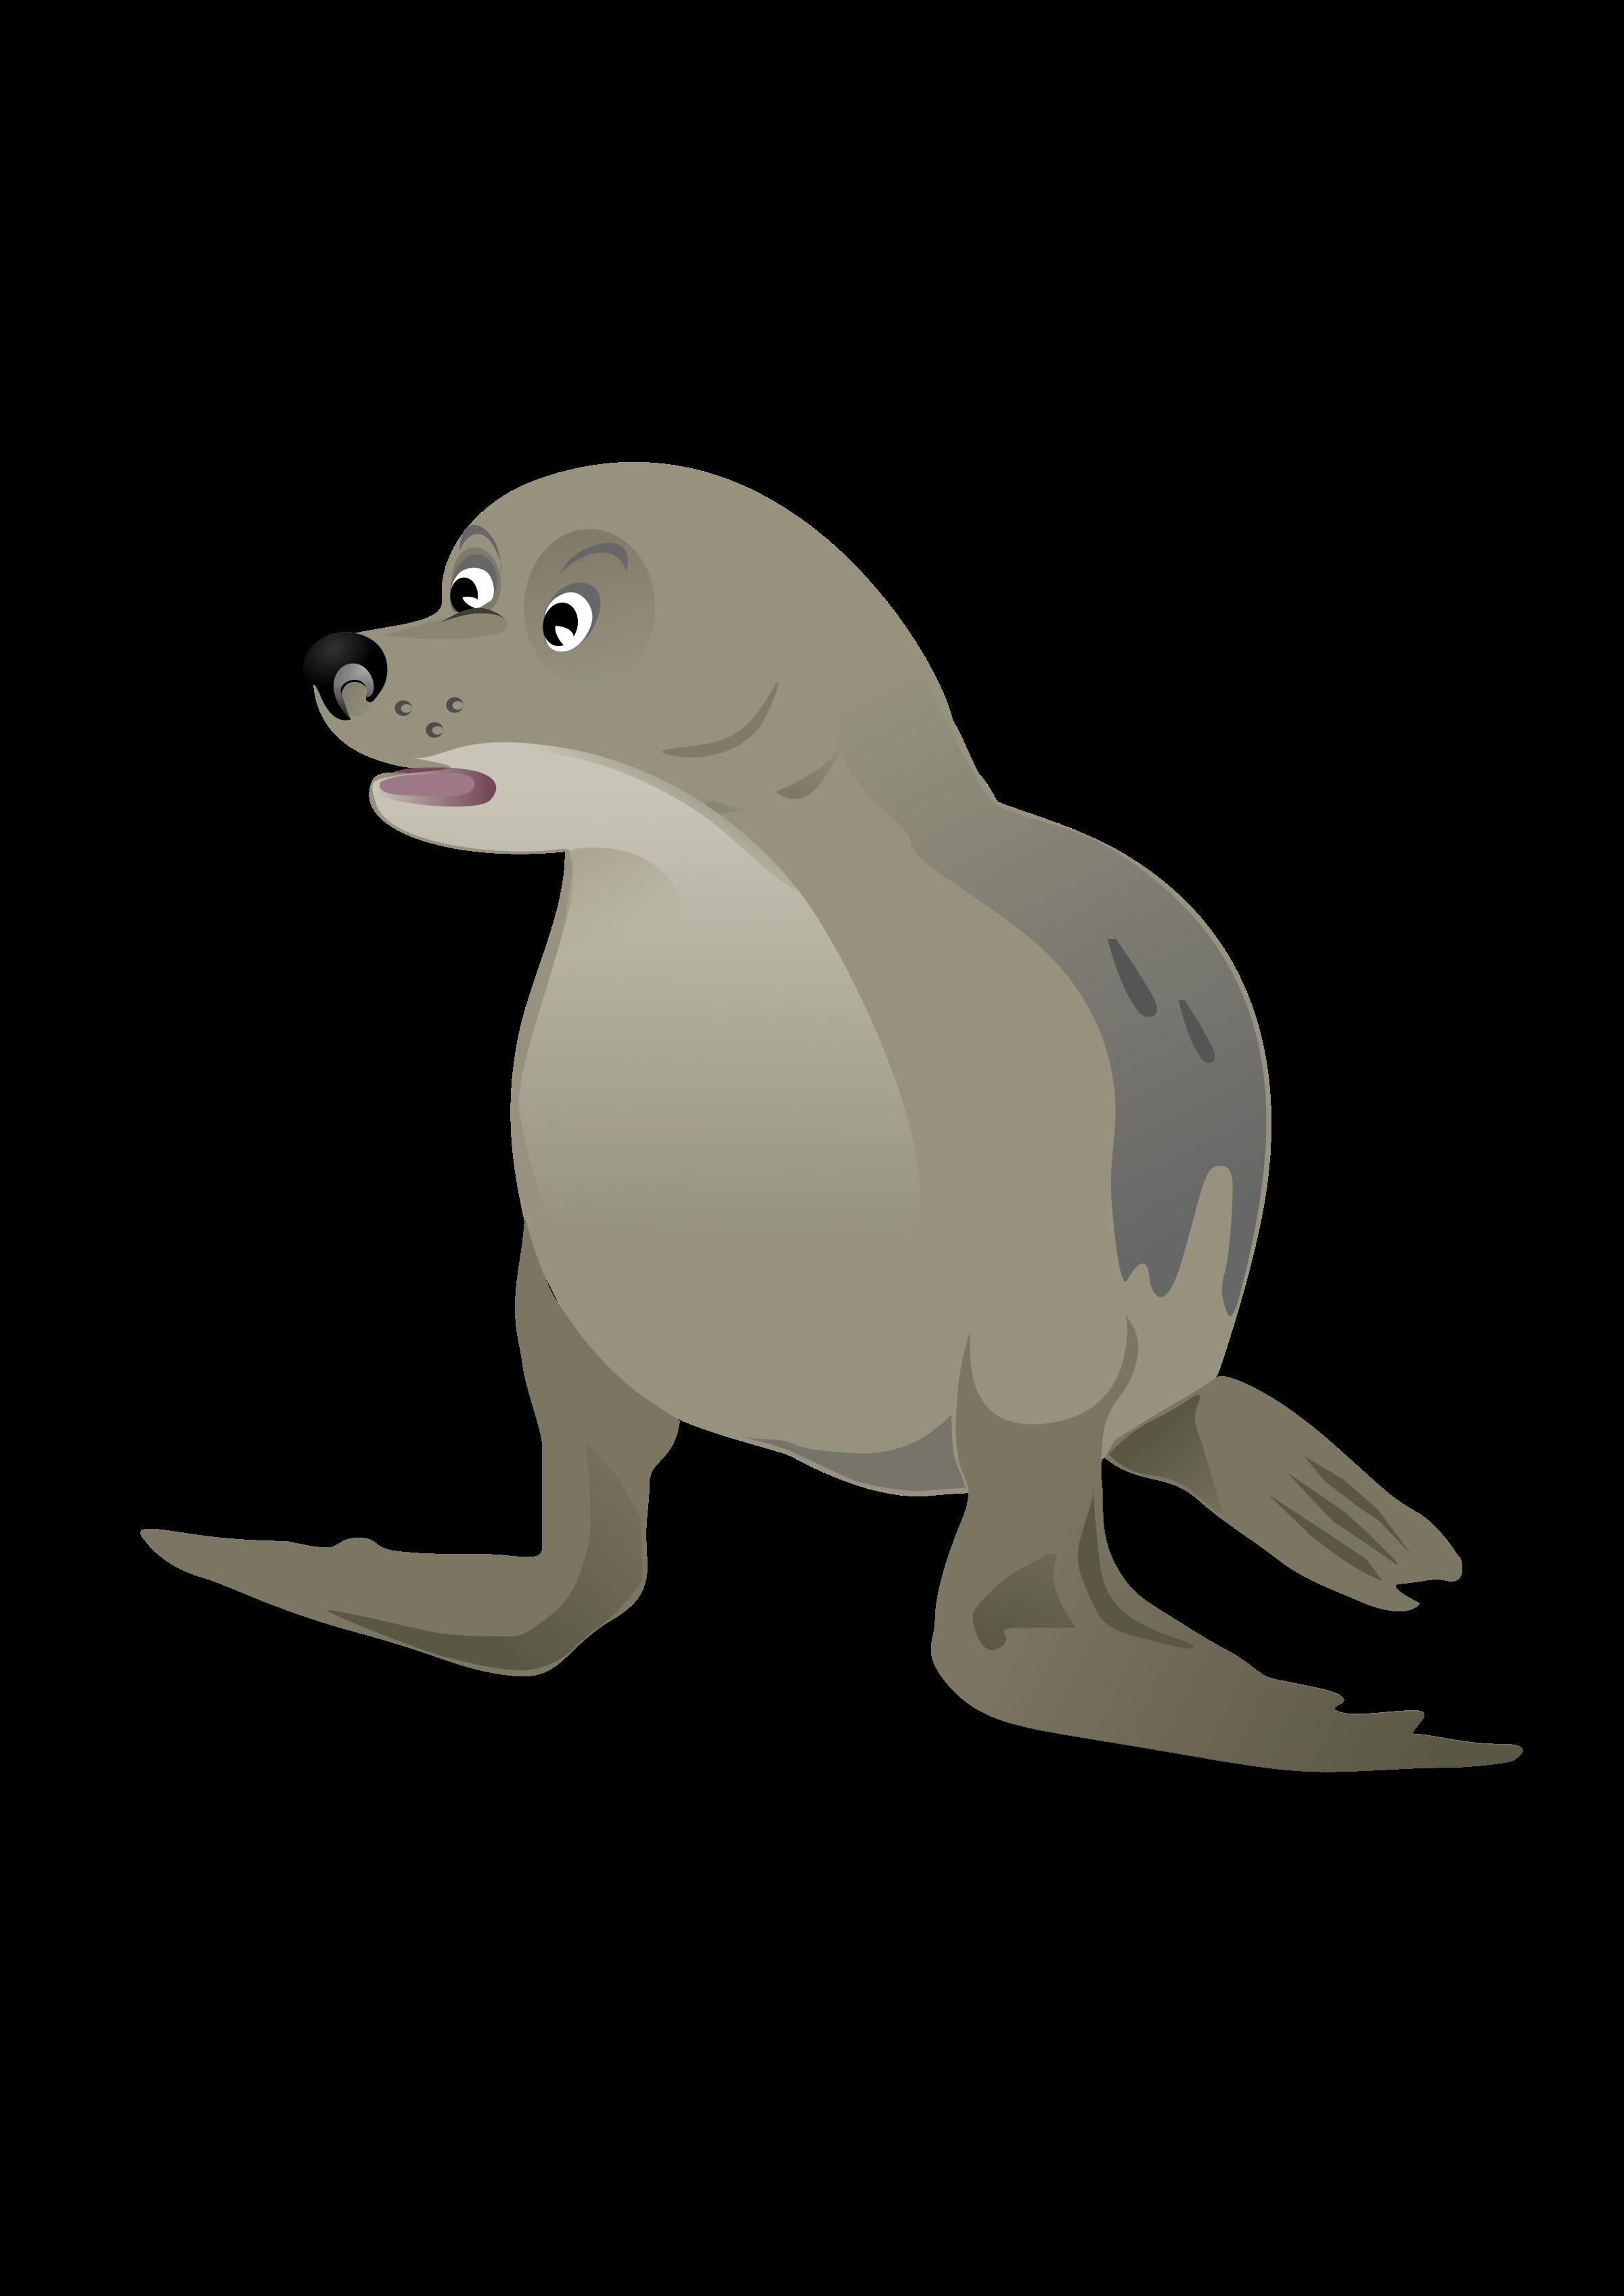 Seal clipart sea otter. Grey big image png